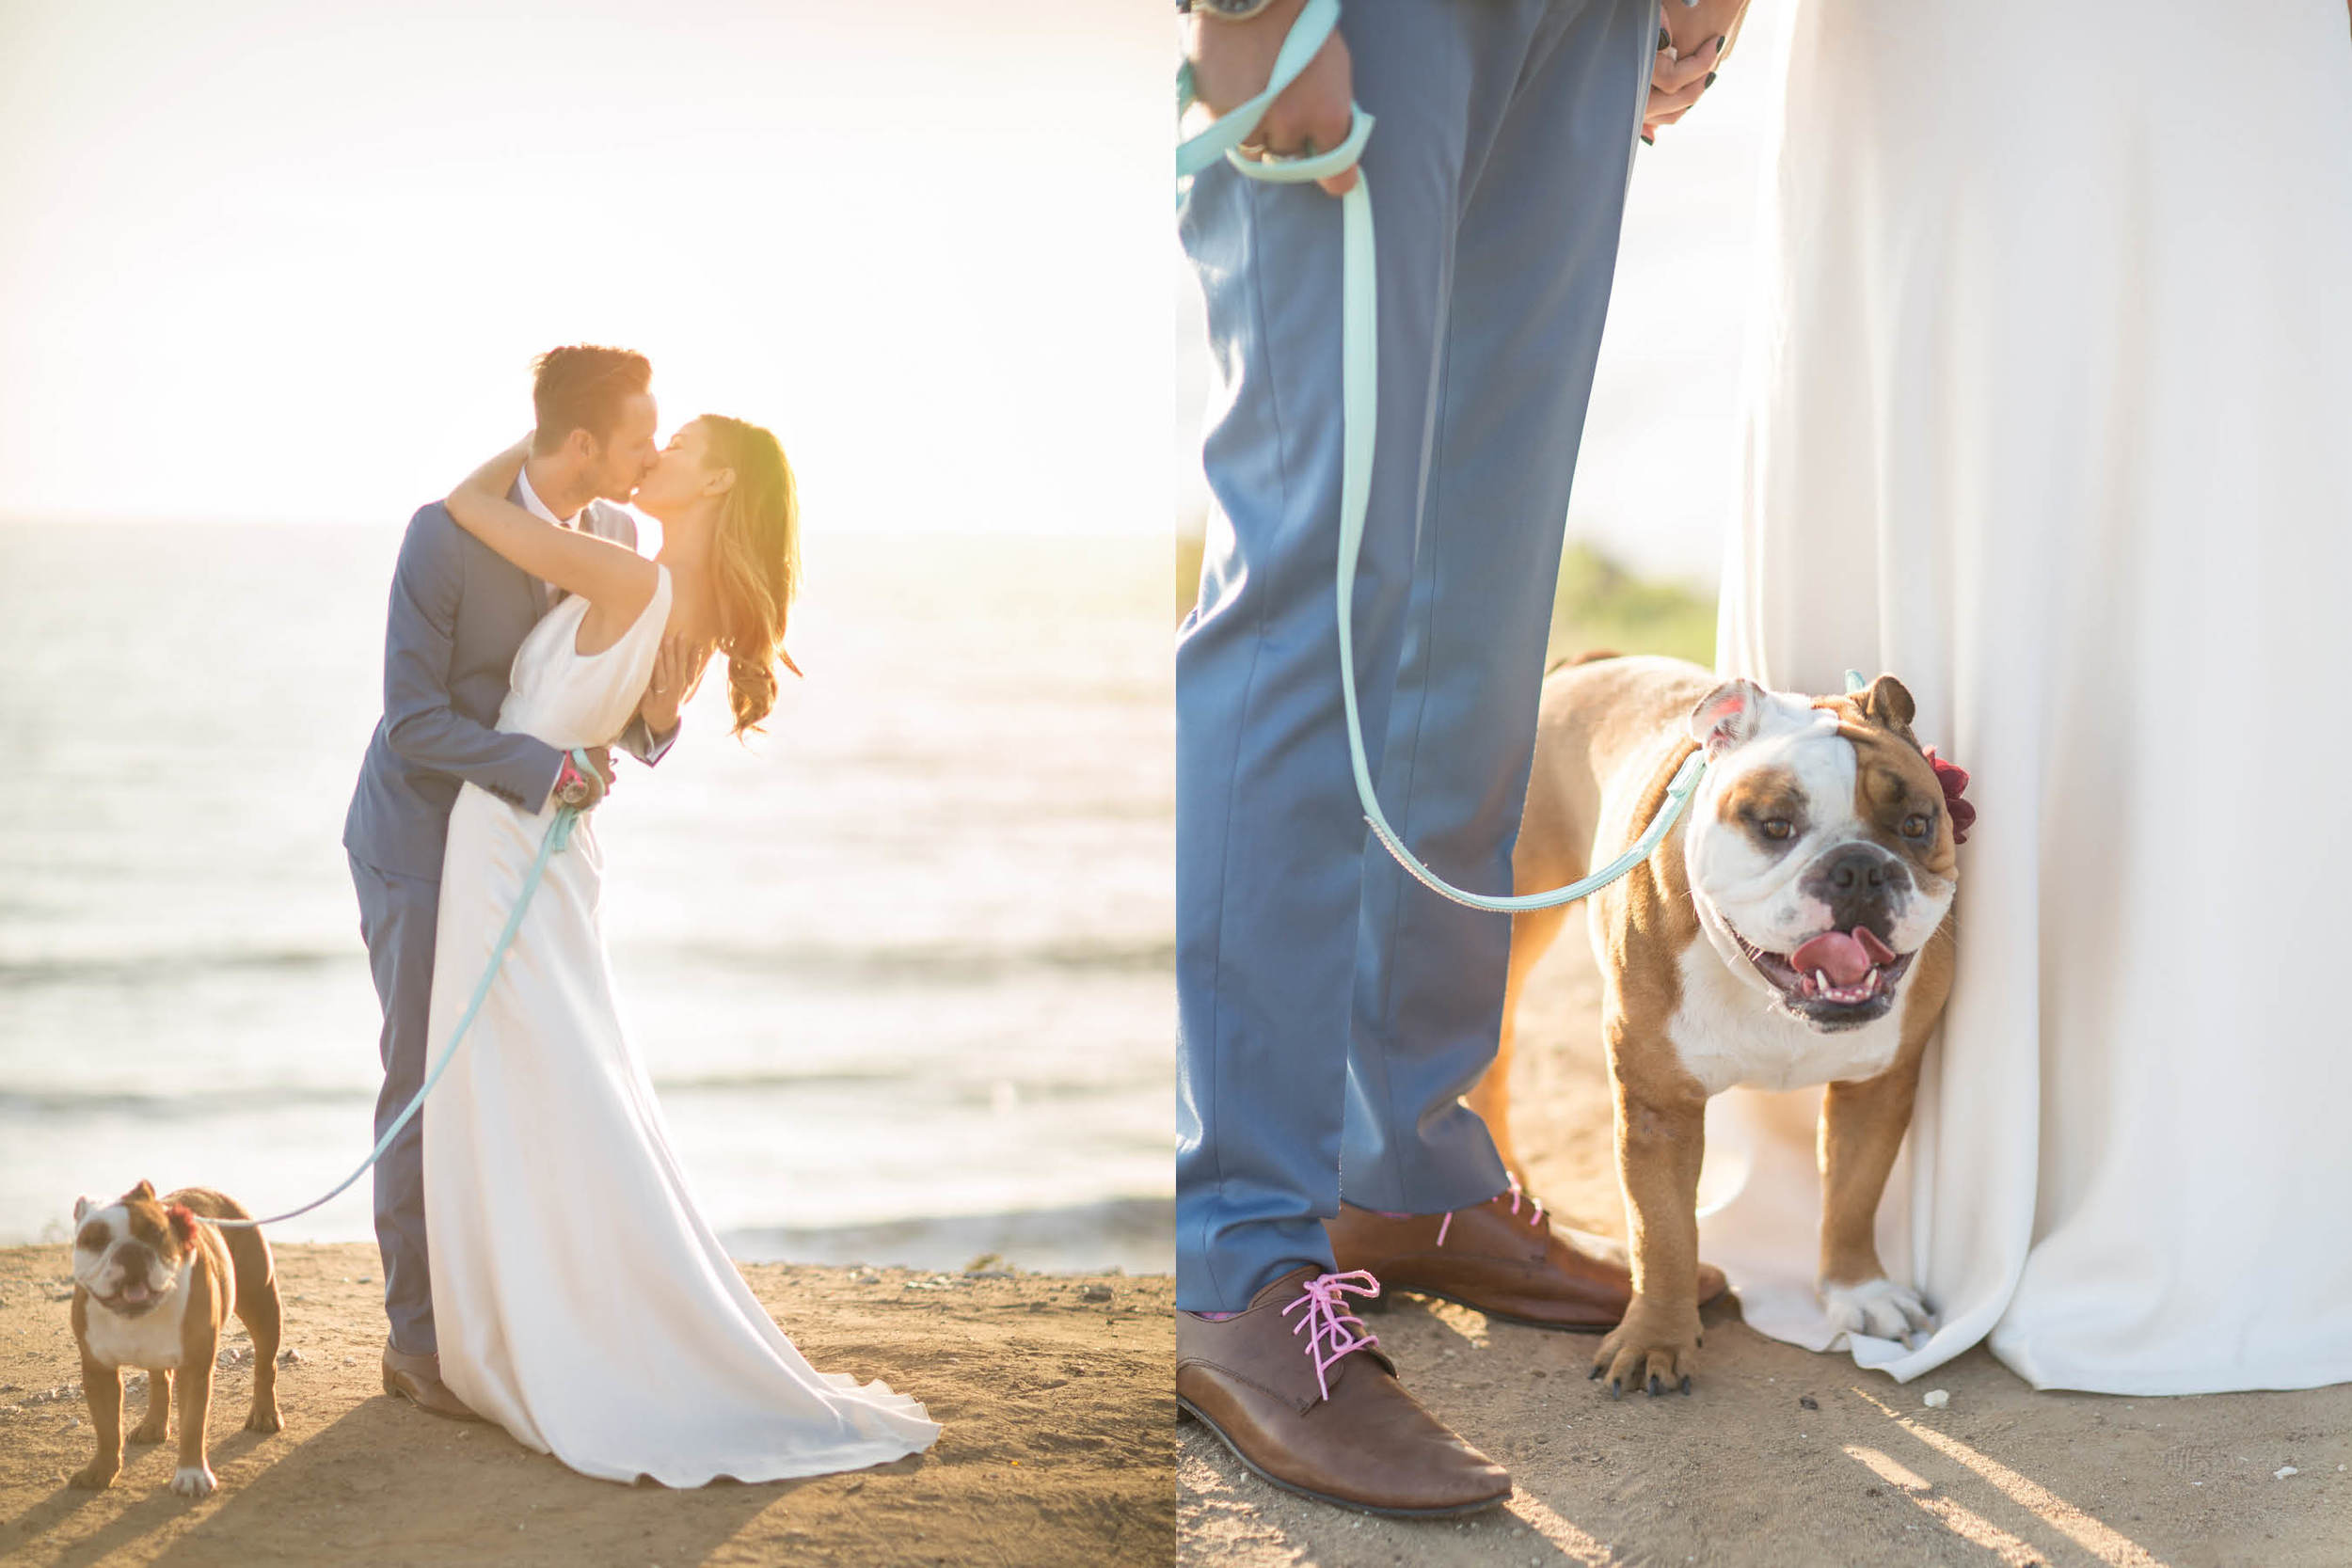 santa-barbara-ellwood-bluff-elopement-wedding-planner-coordinator-rustic-beach-front (32).jpg